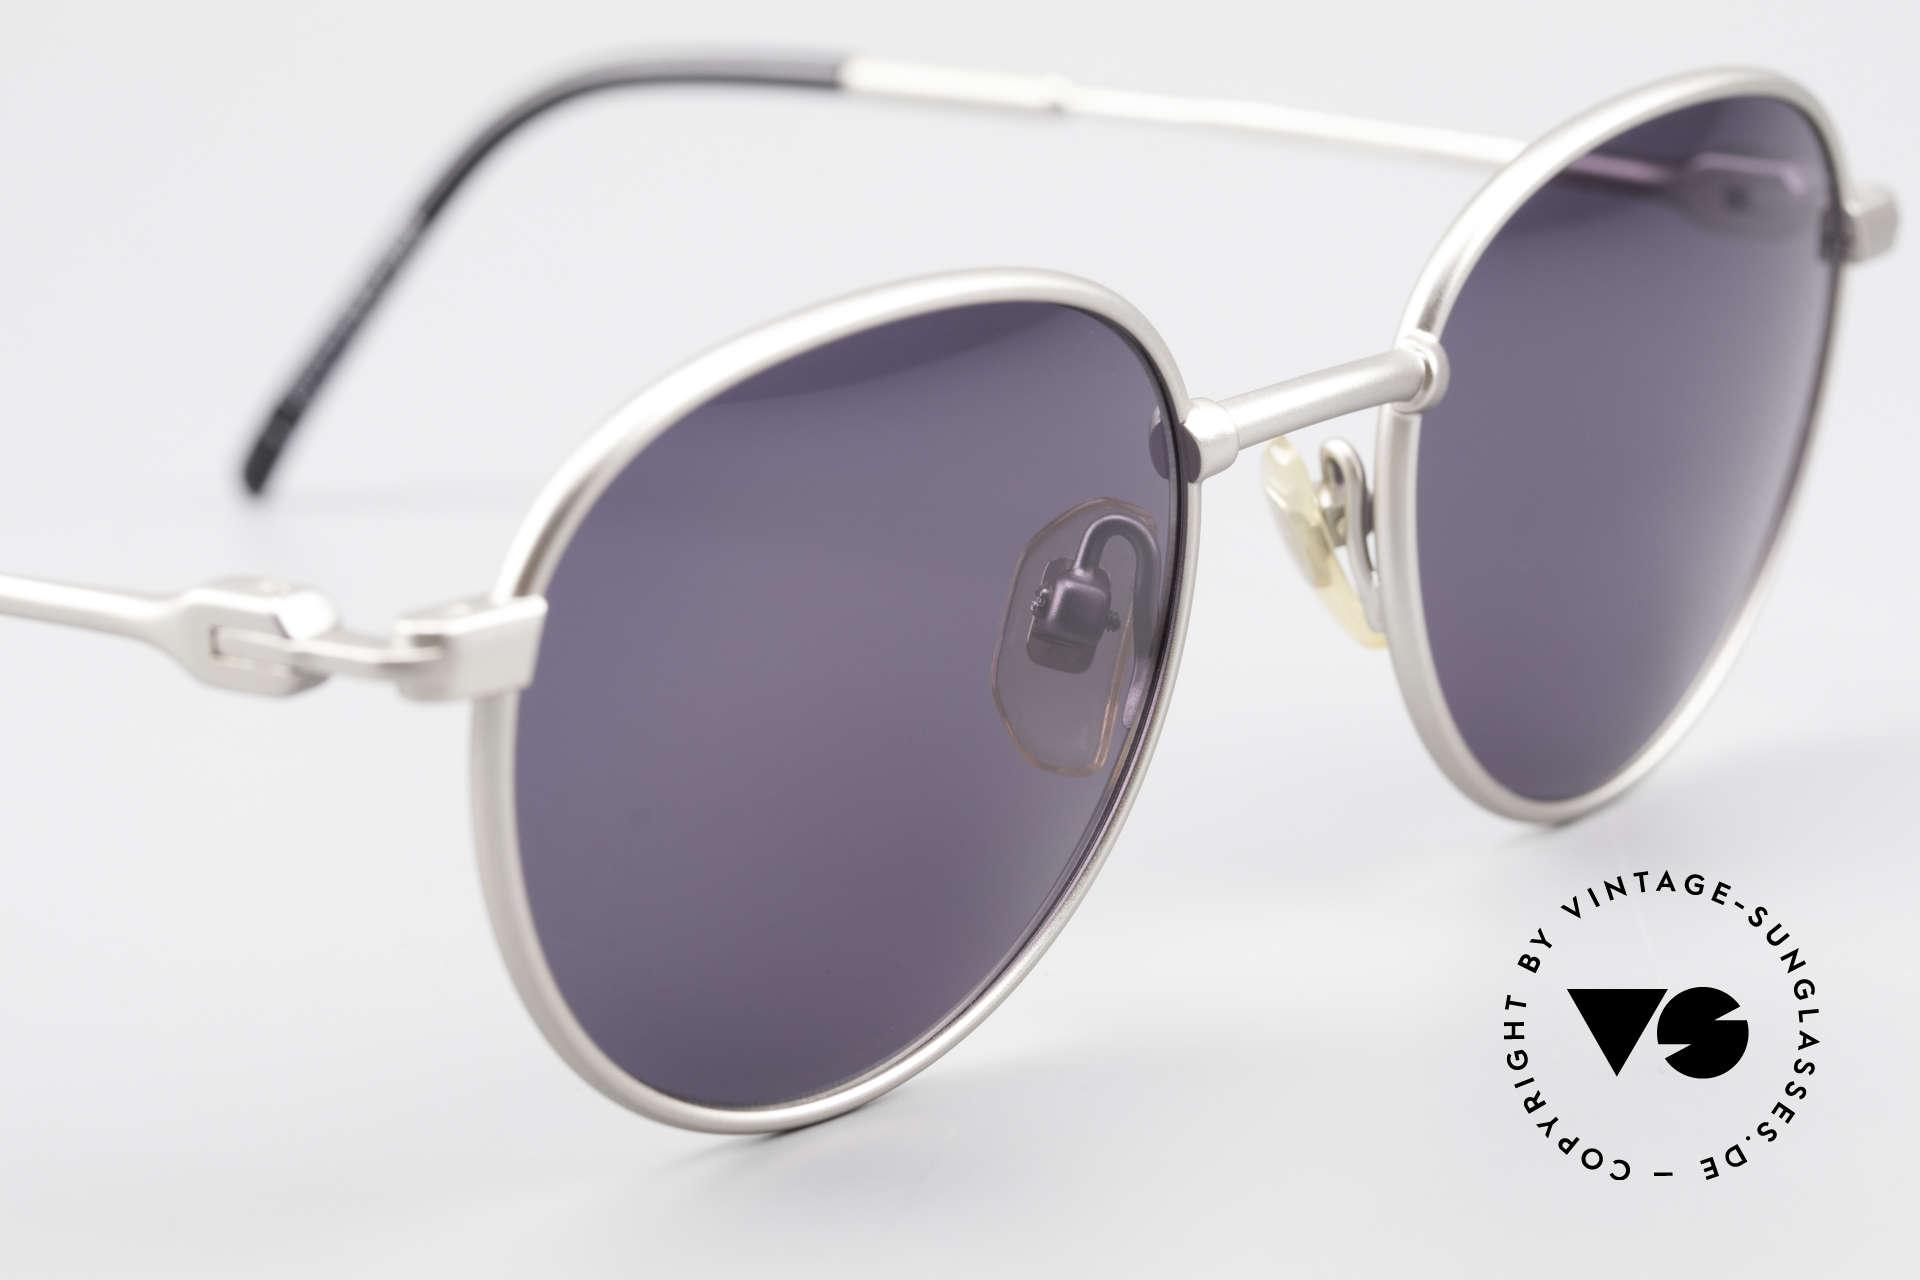 Yohji Yamamoto 52-4102 90's Panto Designer Sunglasses, NO retro shades, but a 25 years old Yamamoto original, Made for Men and Women